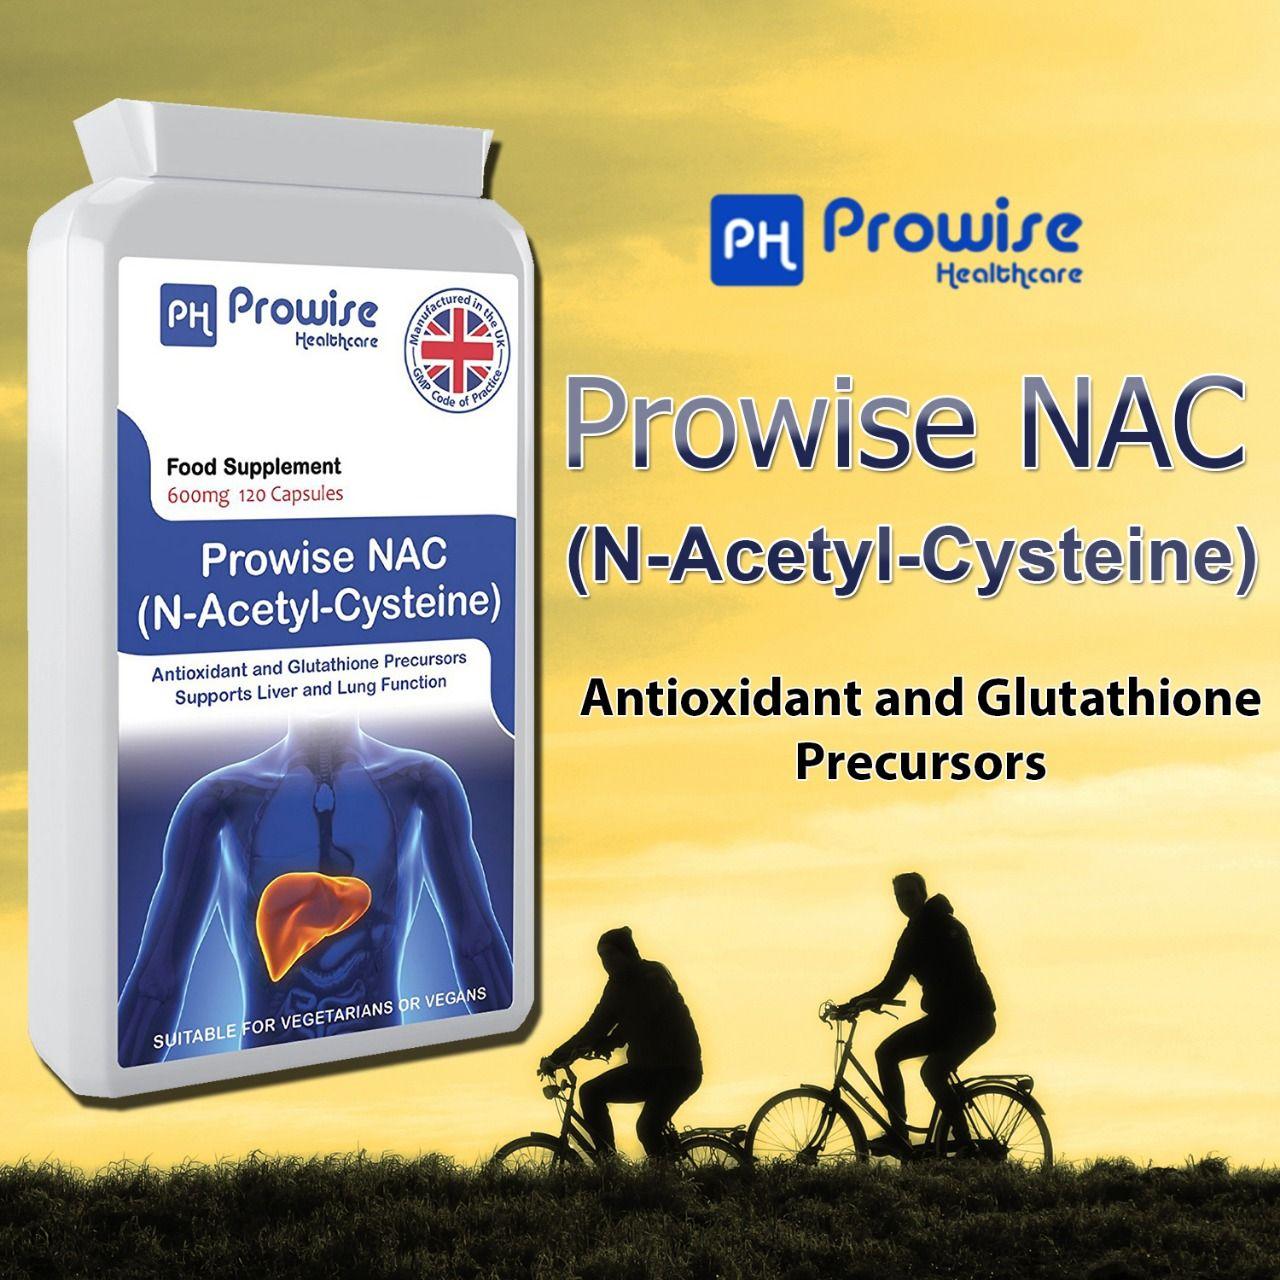 Prowise NAC nac supplement reviews, nac supplement mental